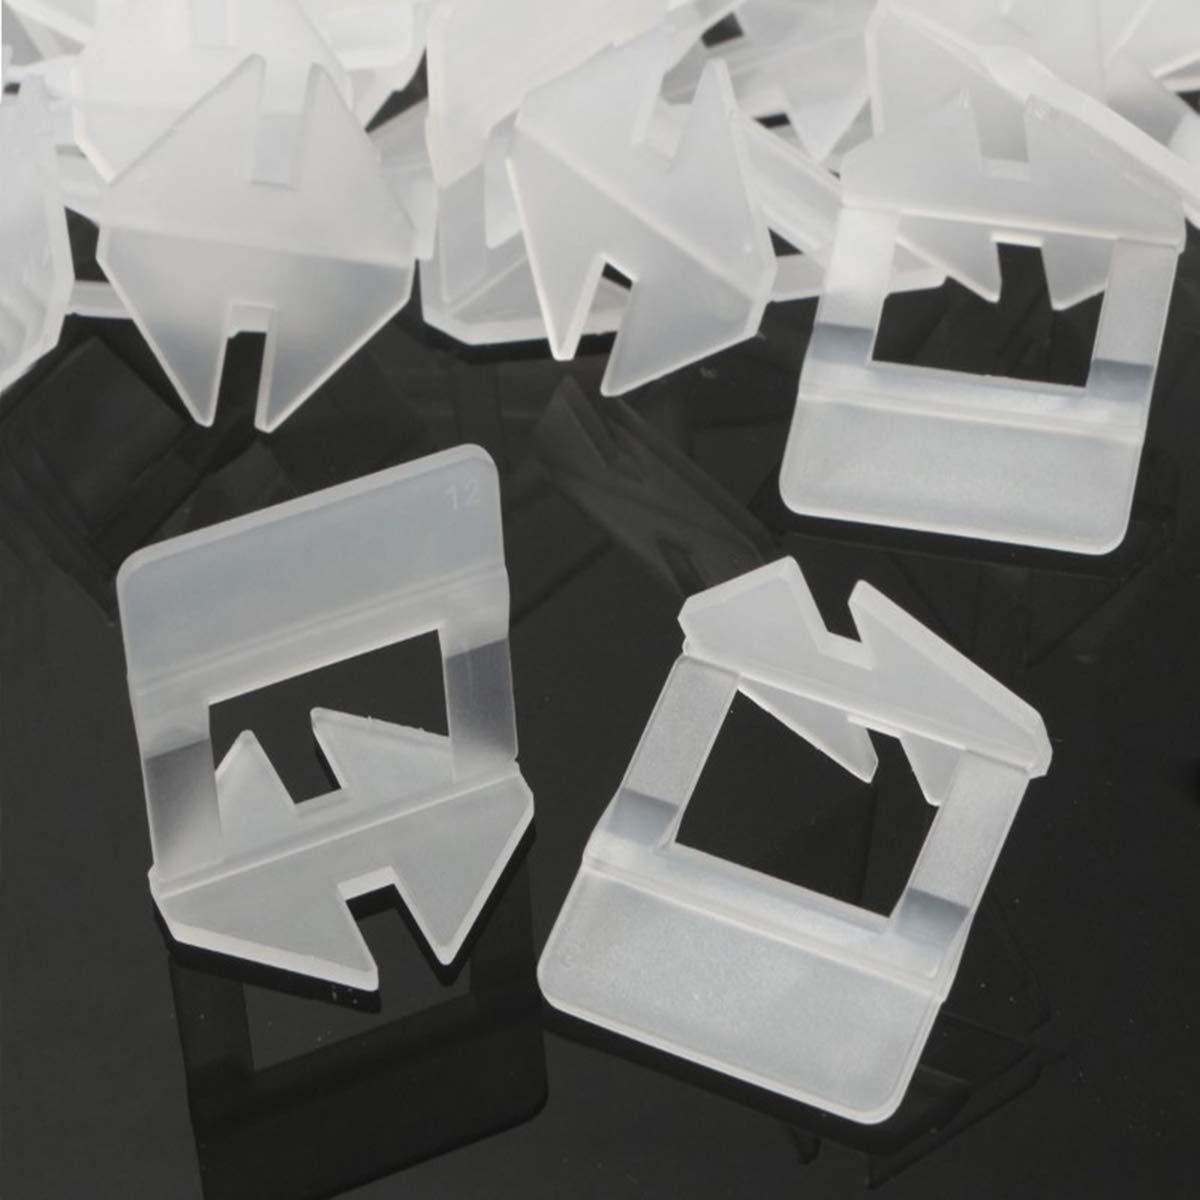 Tile Leveling System Clips - 400 Pcs Clips1/16' (2mm)